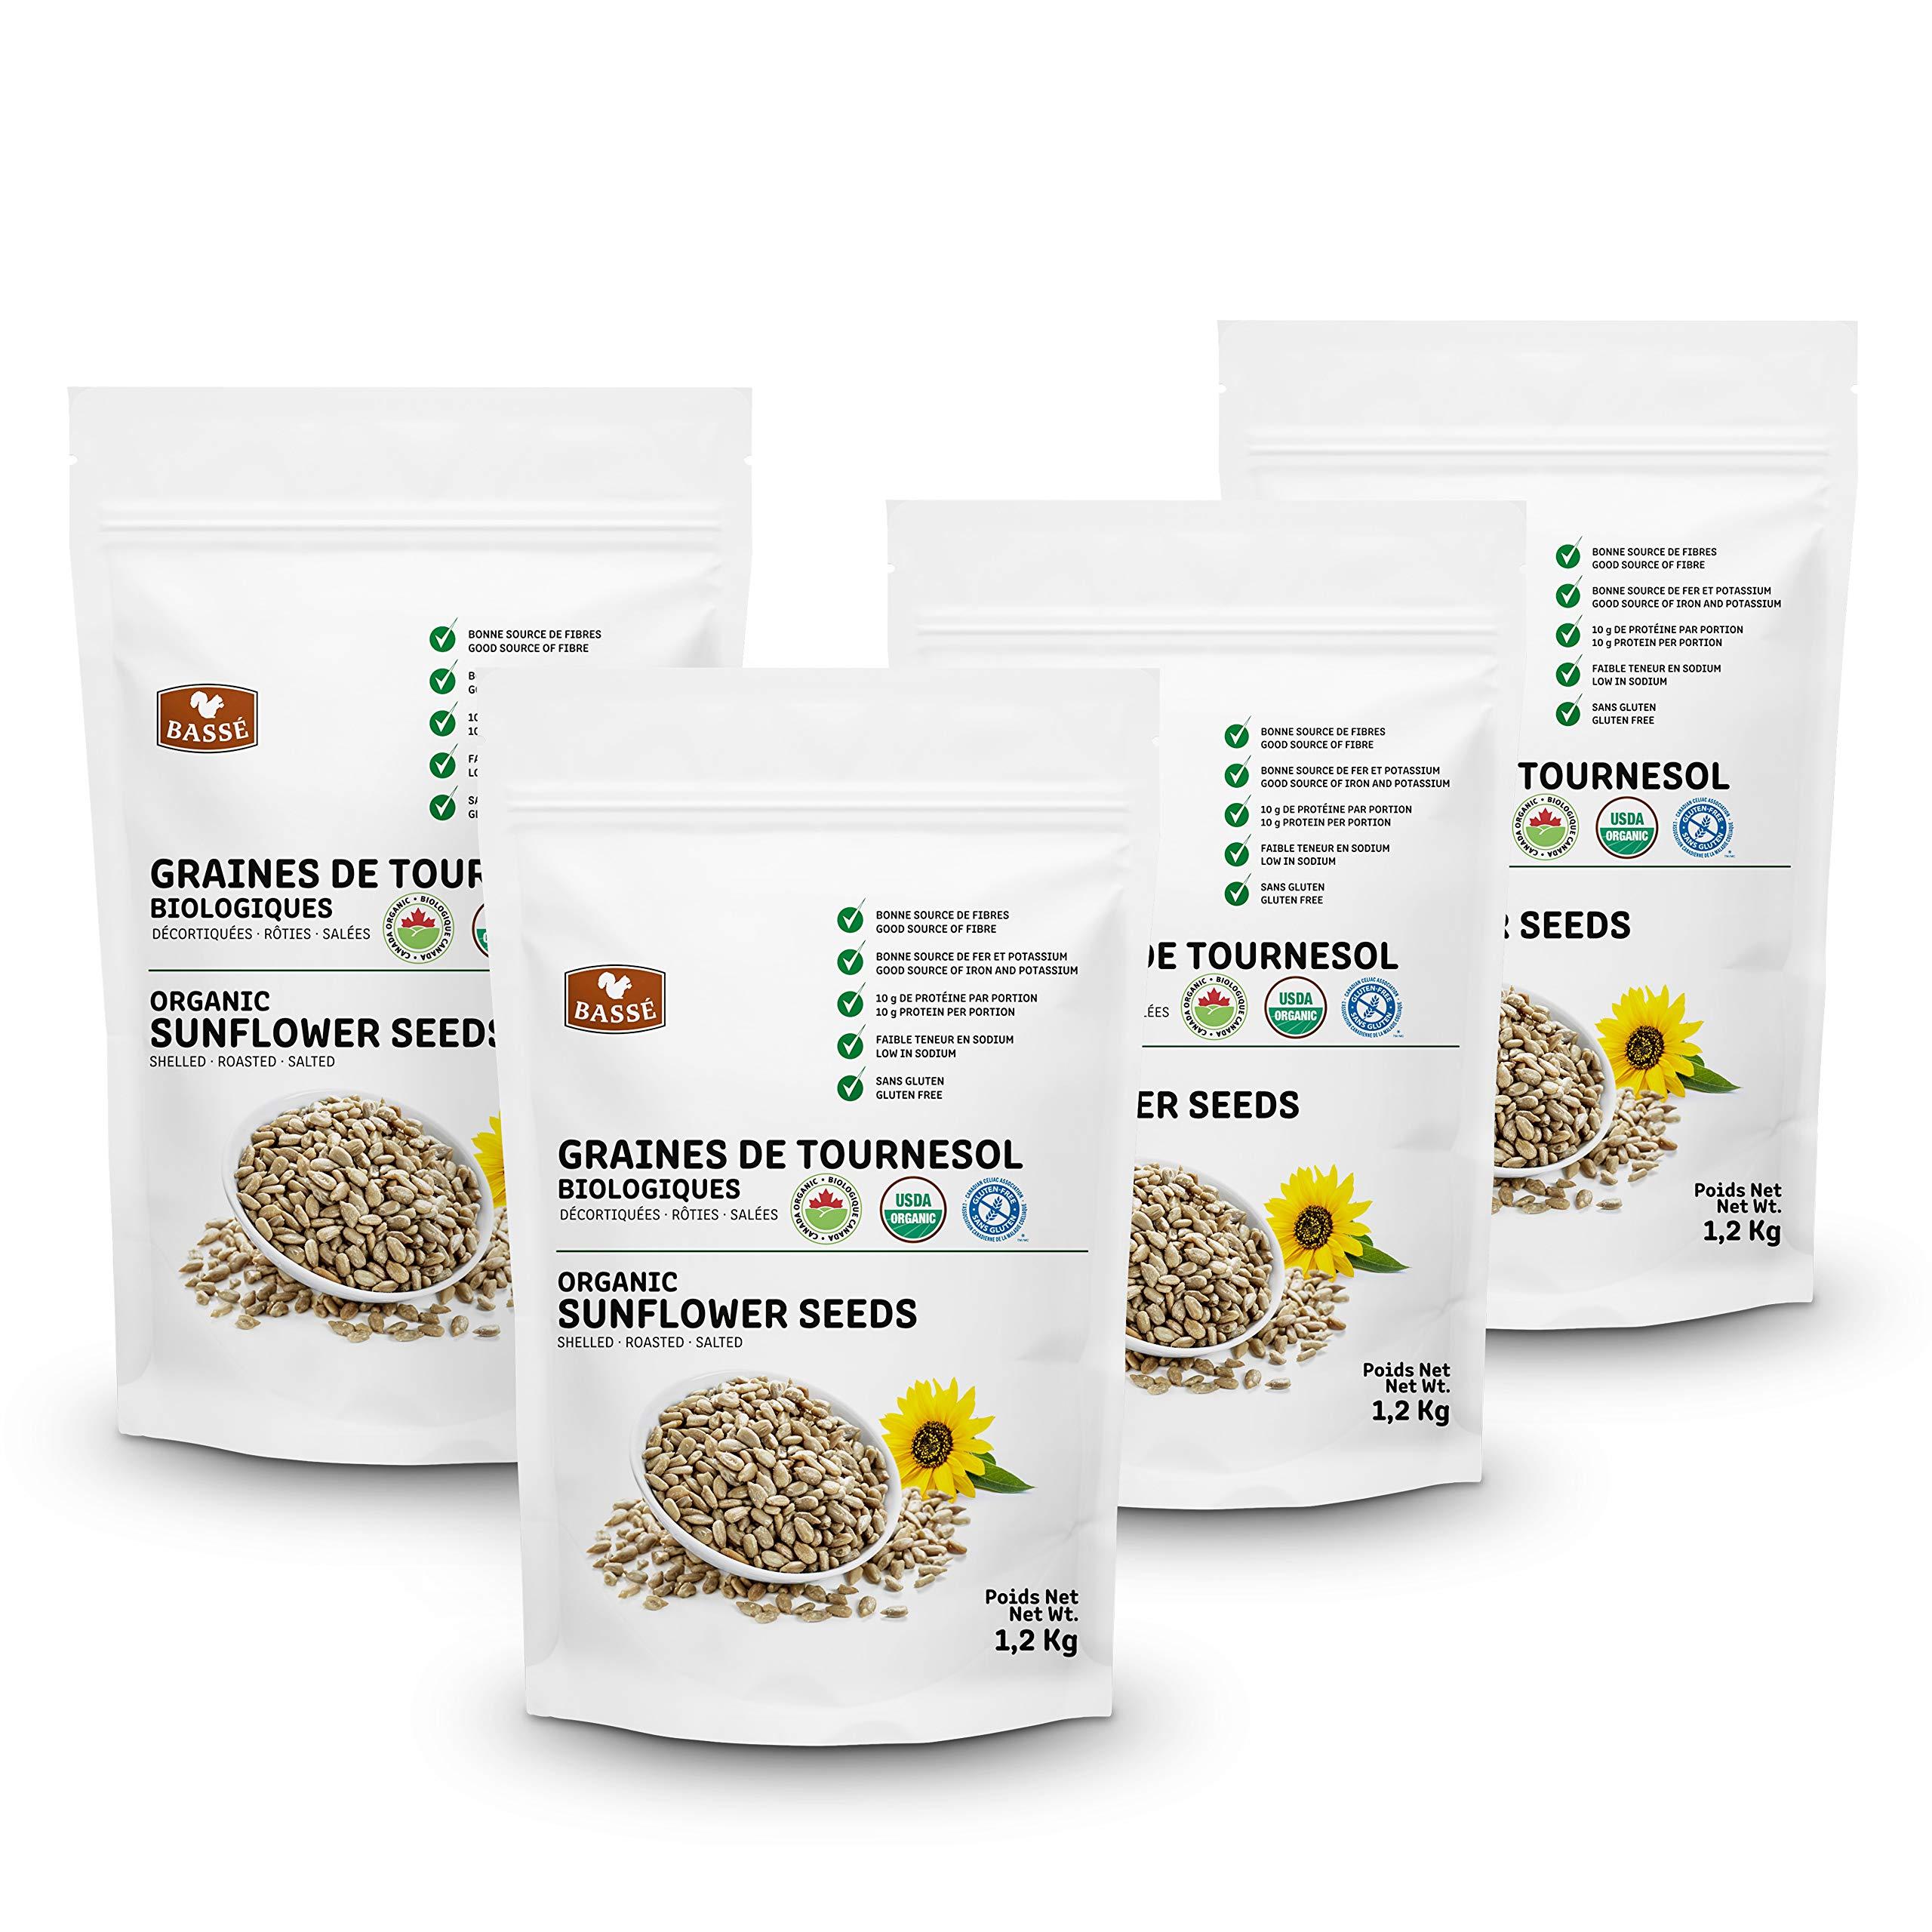 Basse Organic Sunflower Seeds, a Good Source of Fiber, Iron, and Potassium, Gluten Free – Kosher Certified 10.56 lb